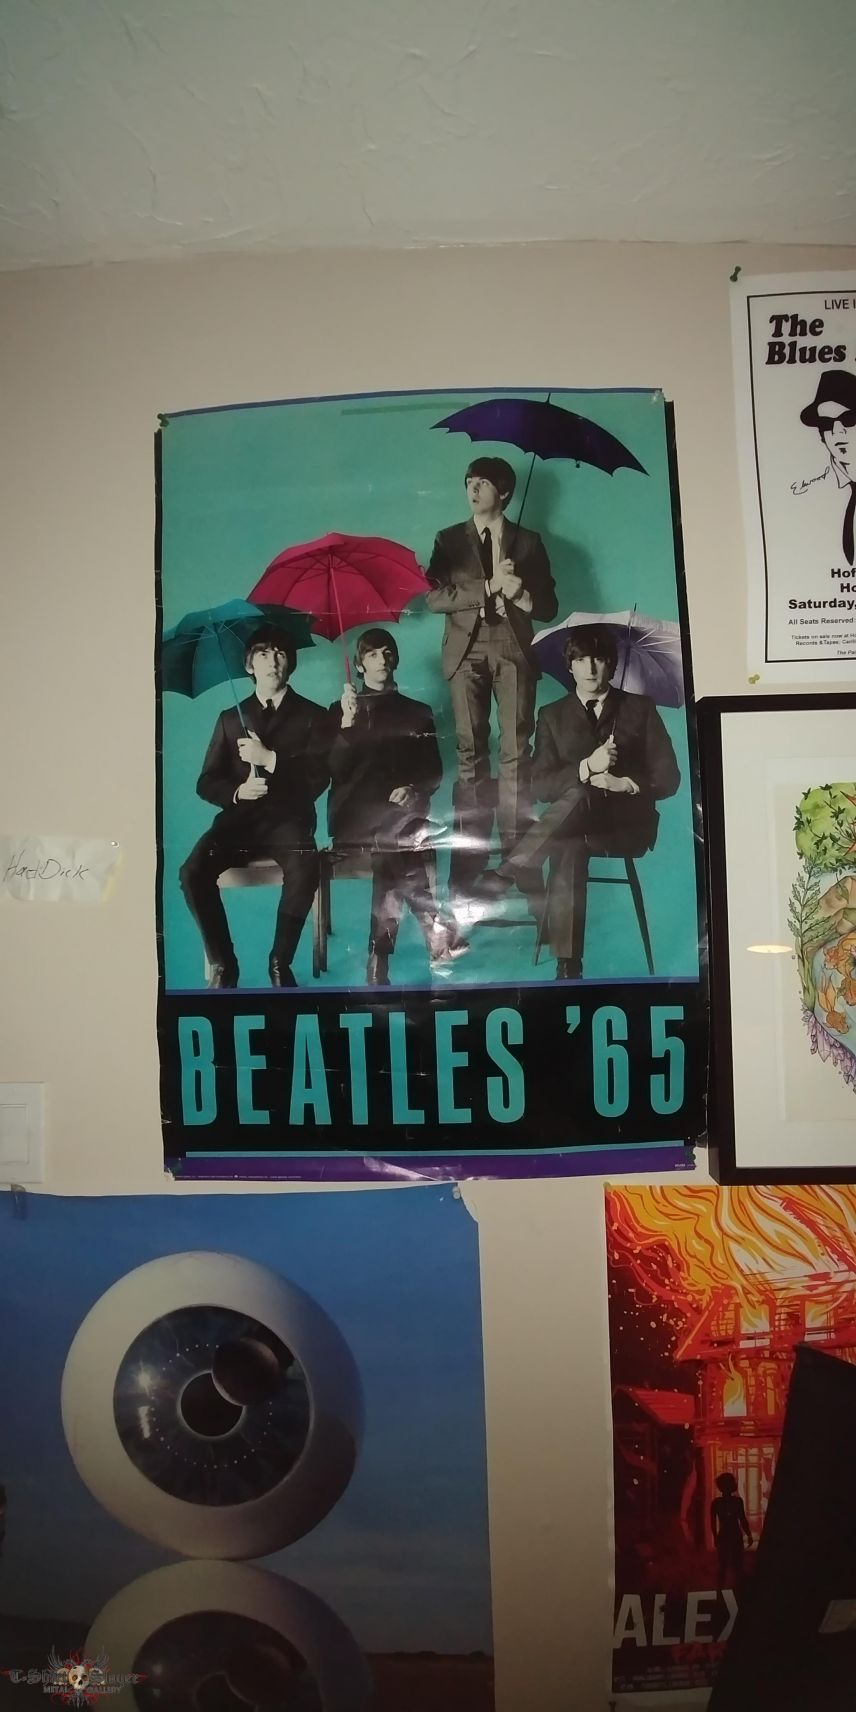 The Beatles 1987